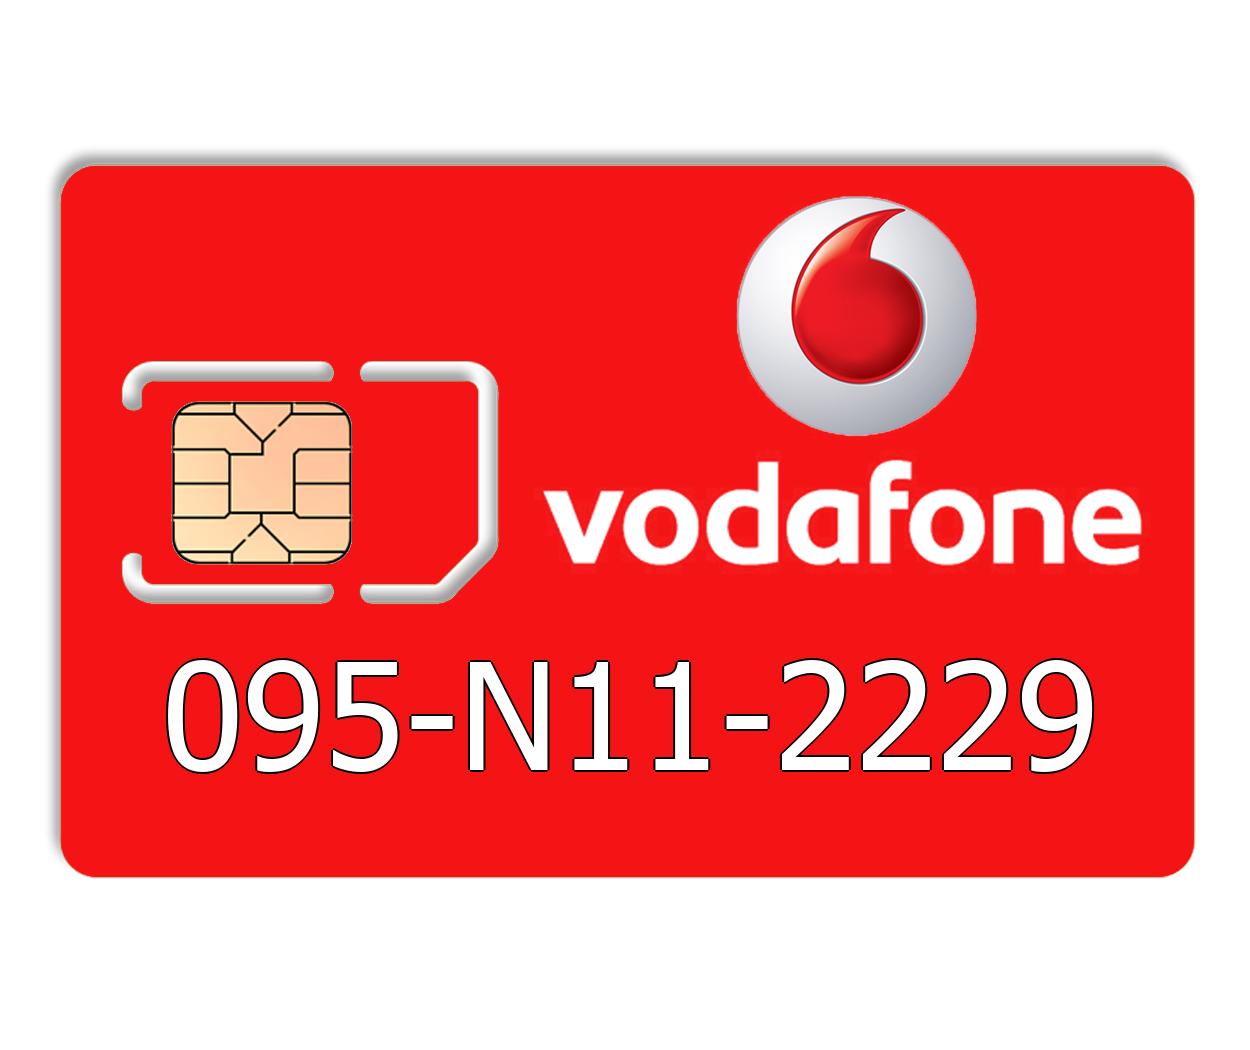 Красивый номер Vodafone 095-N11-2229